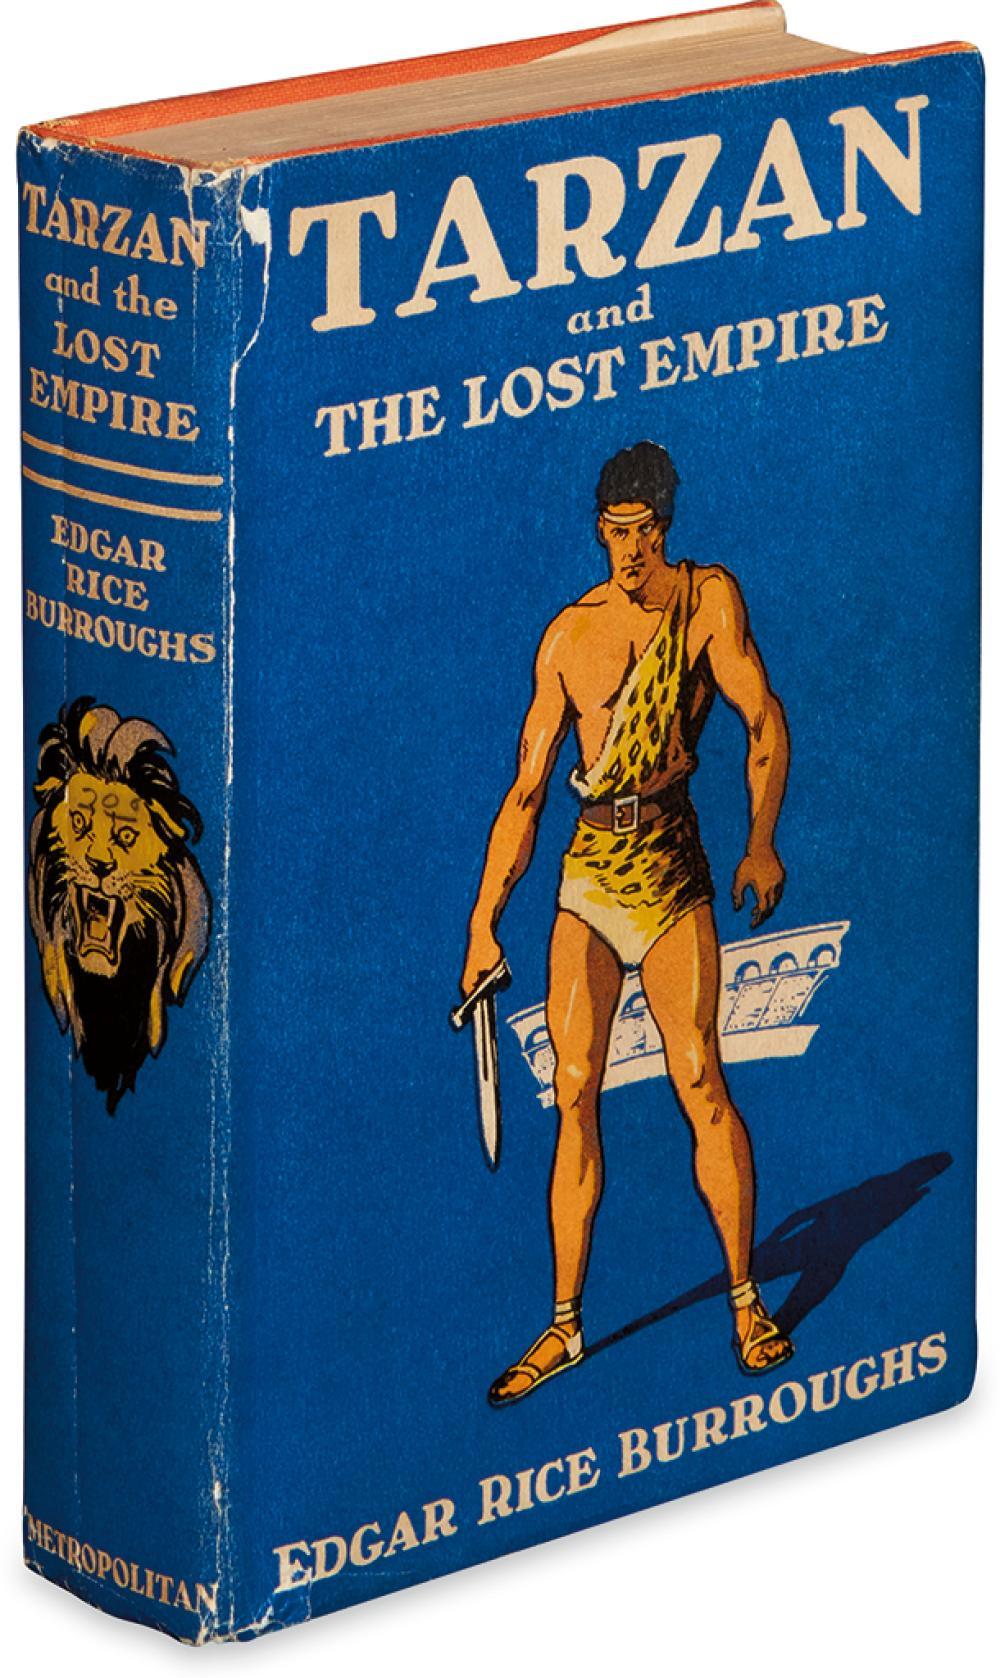 BURROUGHS, EDGAR RICE. Tarzan and the Lost Empire.